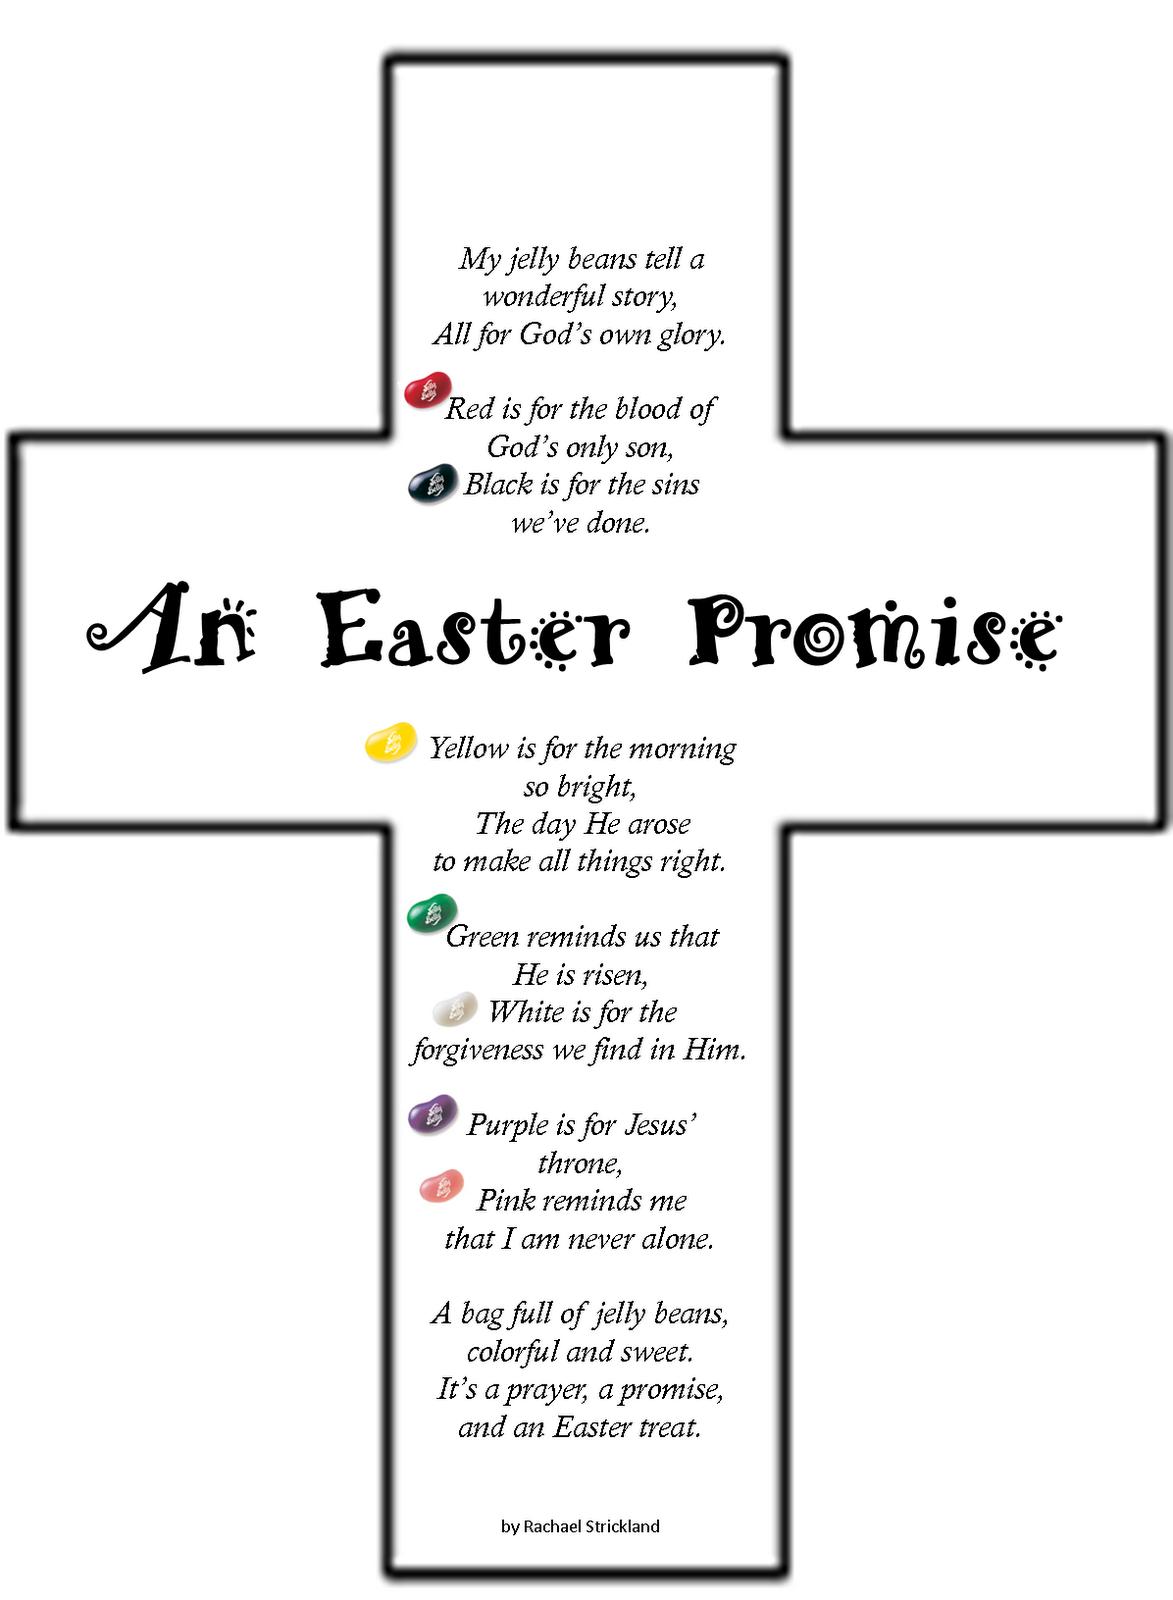 Teaching Integrity Easter Jelly Bean Poem